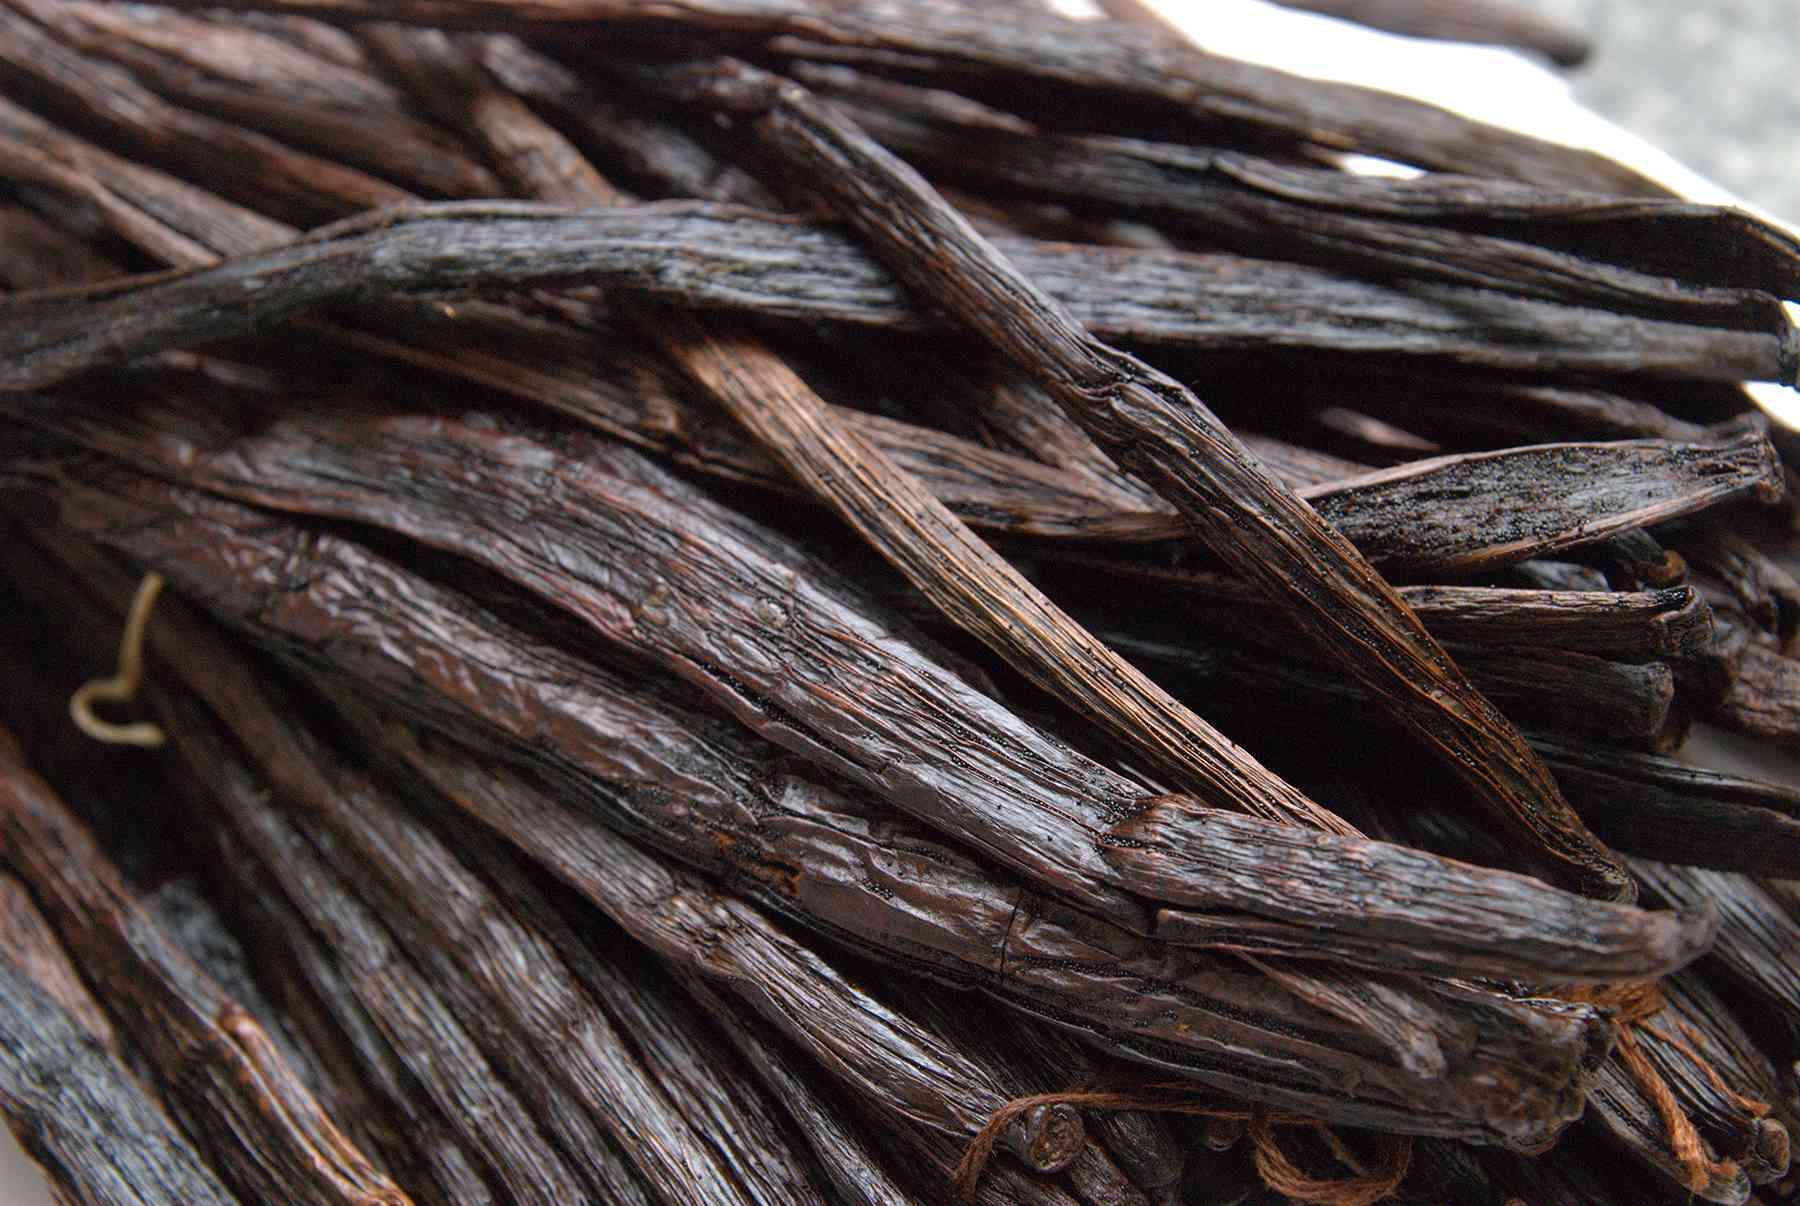 vanillabeans many vanilla beans - viele Vanielleschoten